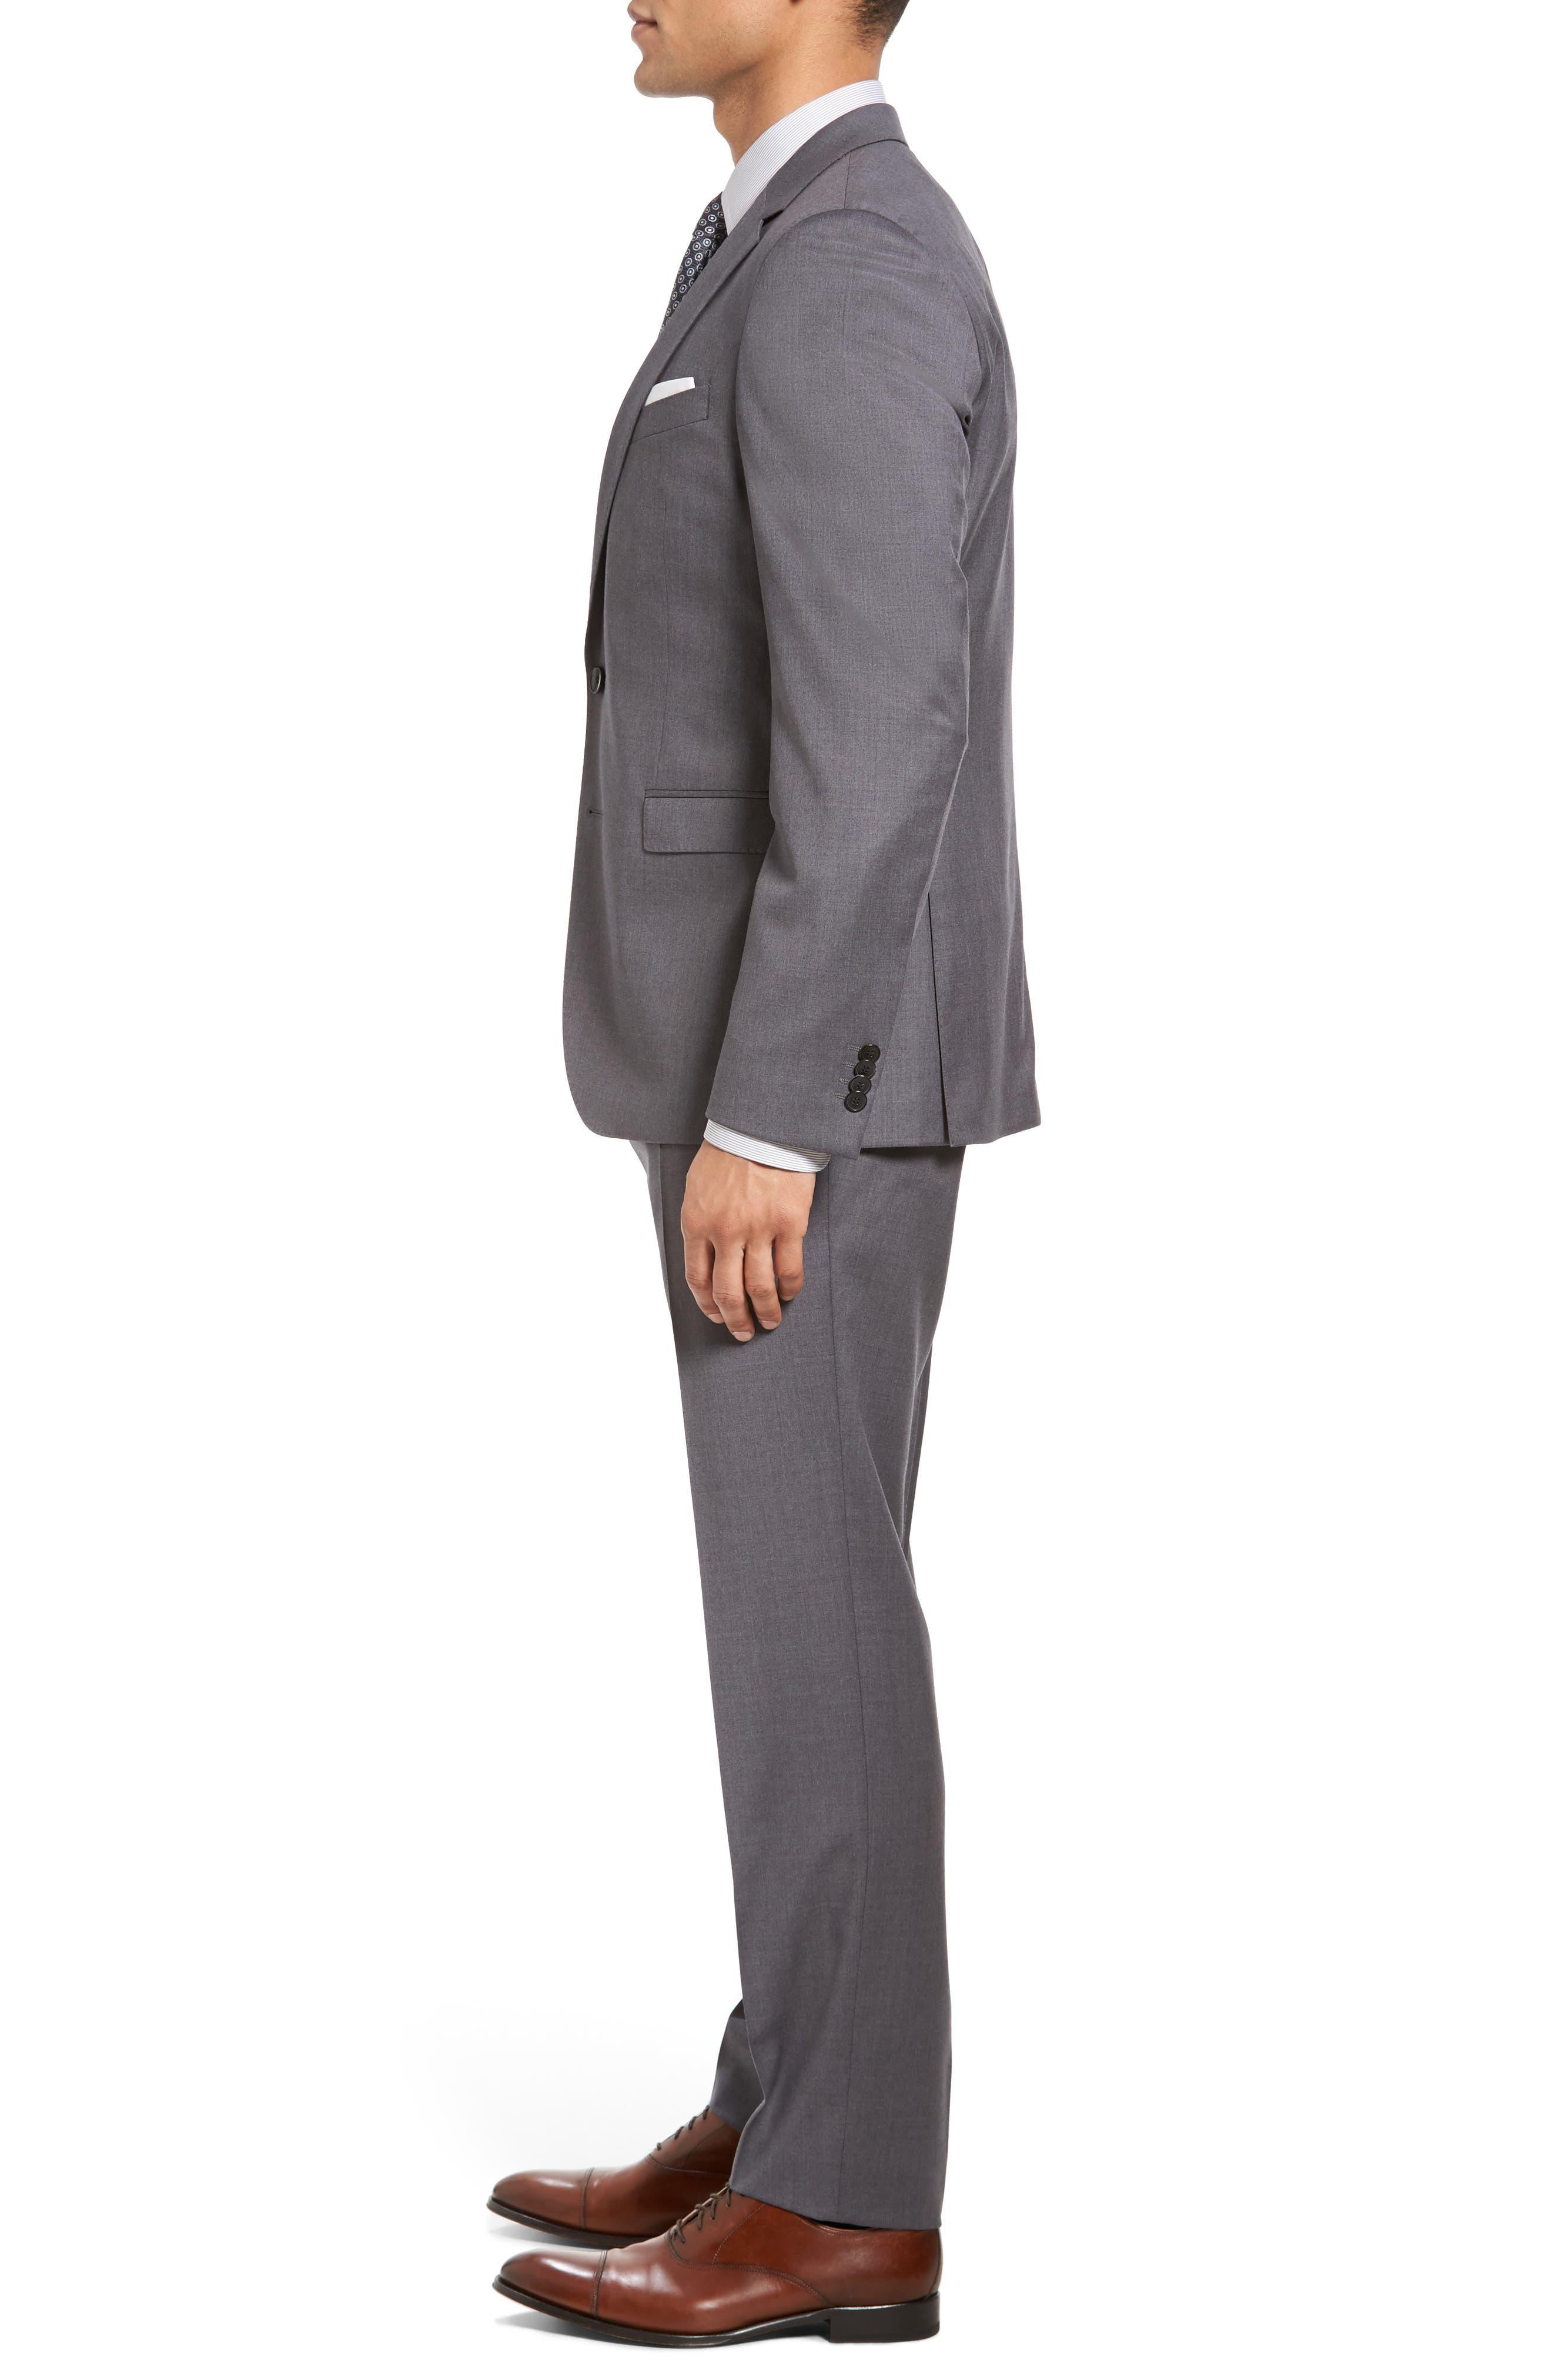 Ryan/Win Trim Fit Solid Wool Suit,                             Alternate thumbnail 3, color,                             031